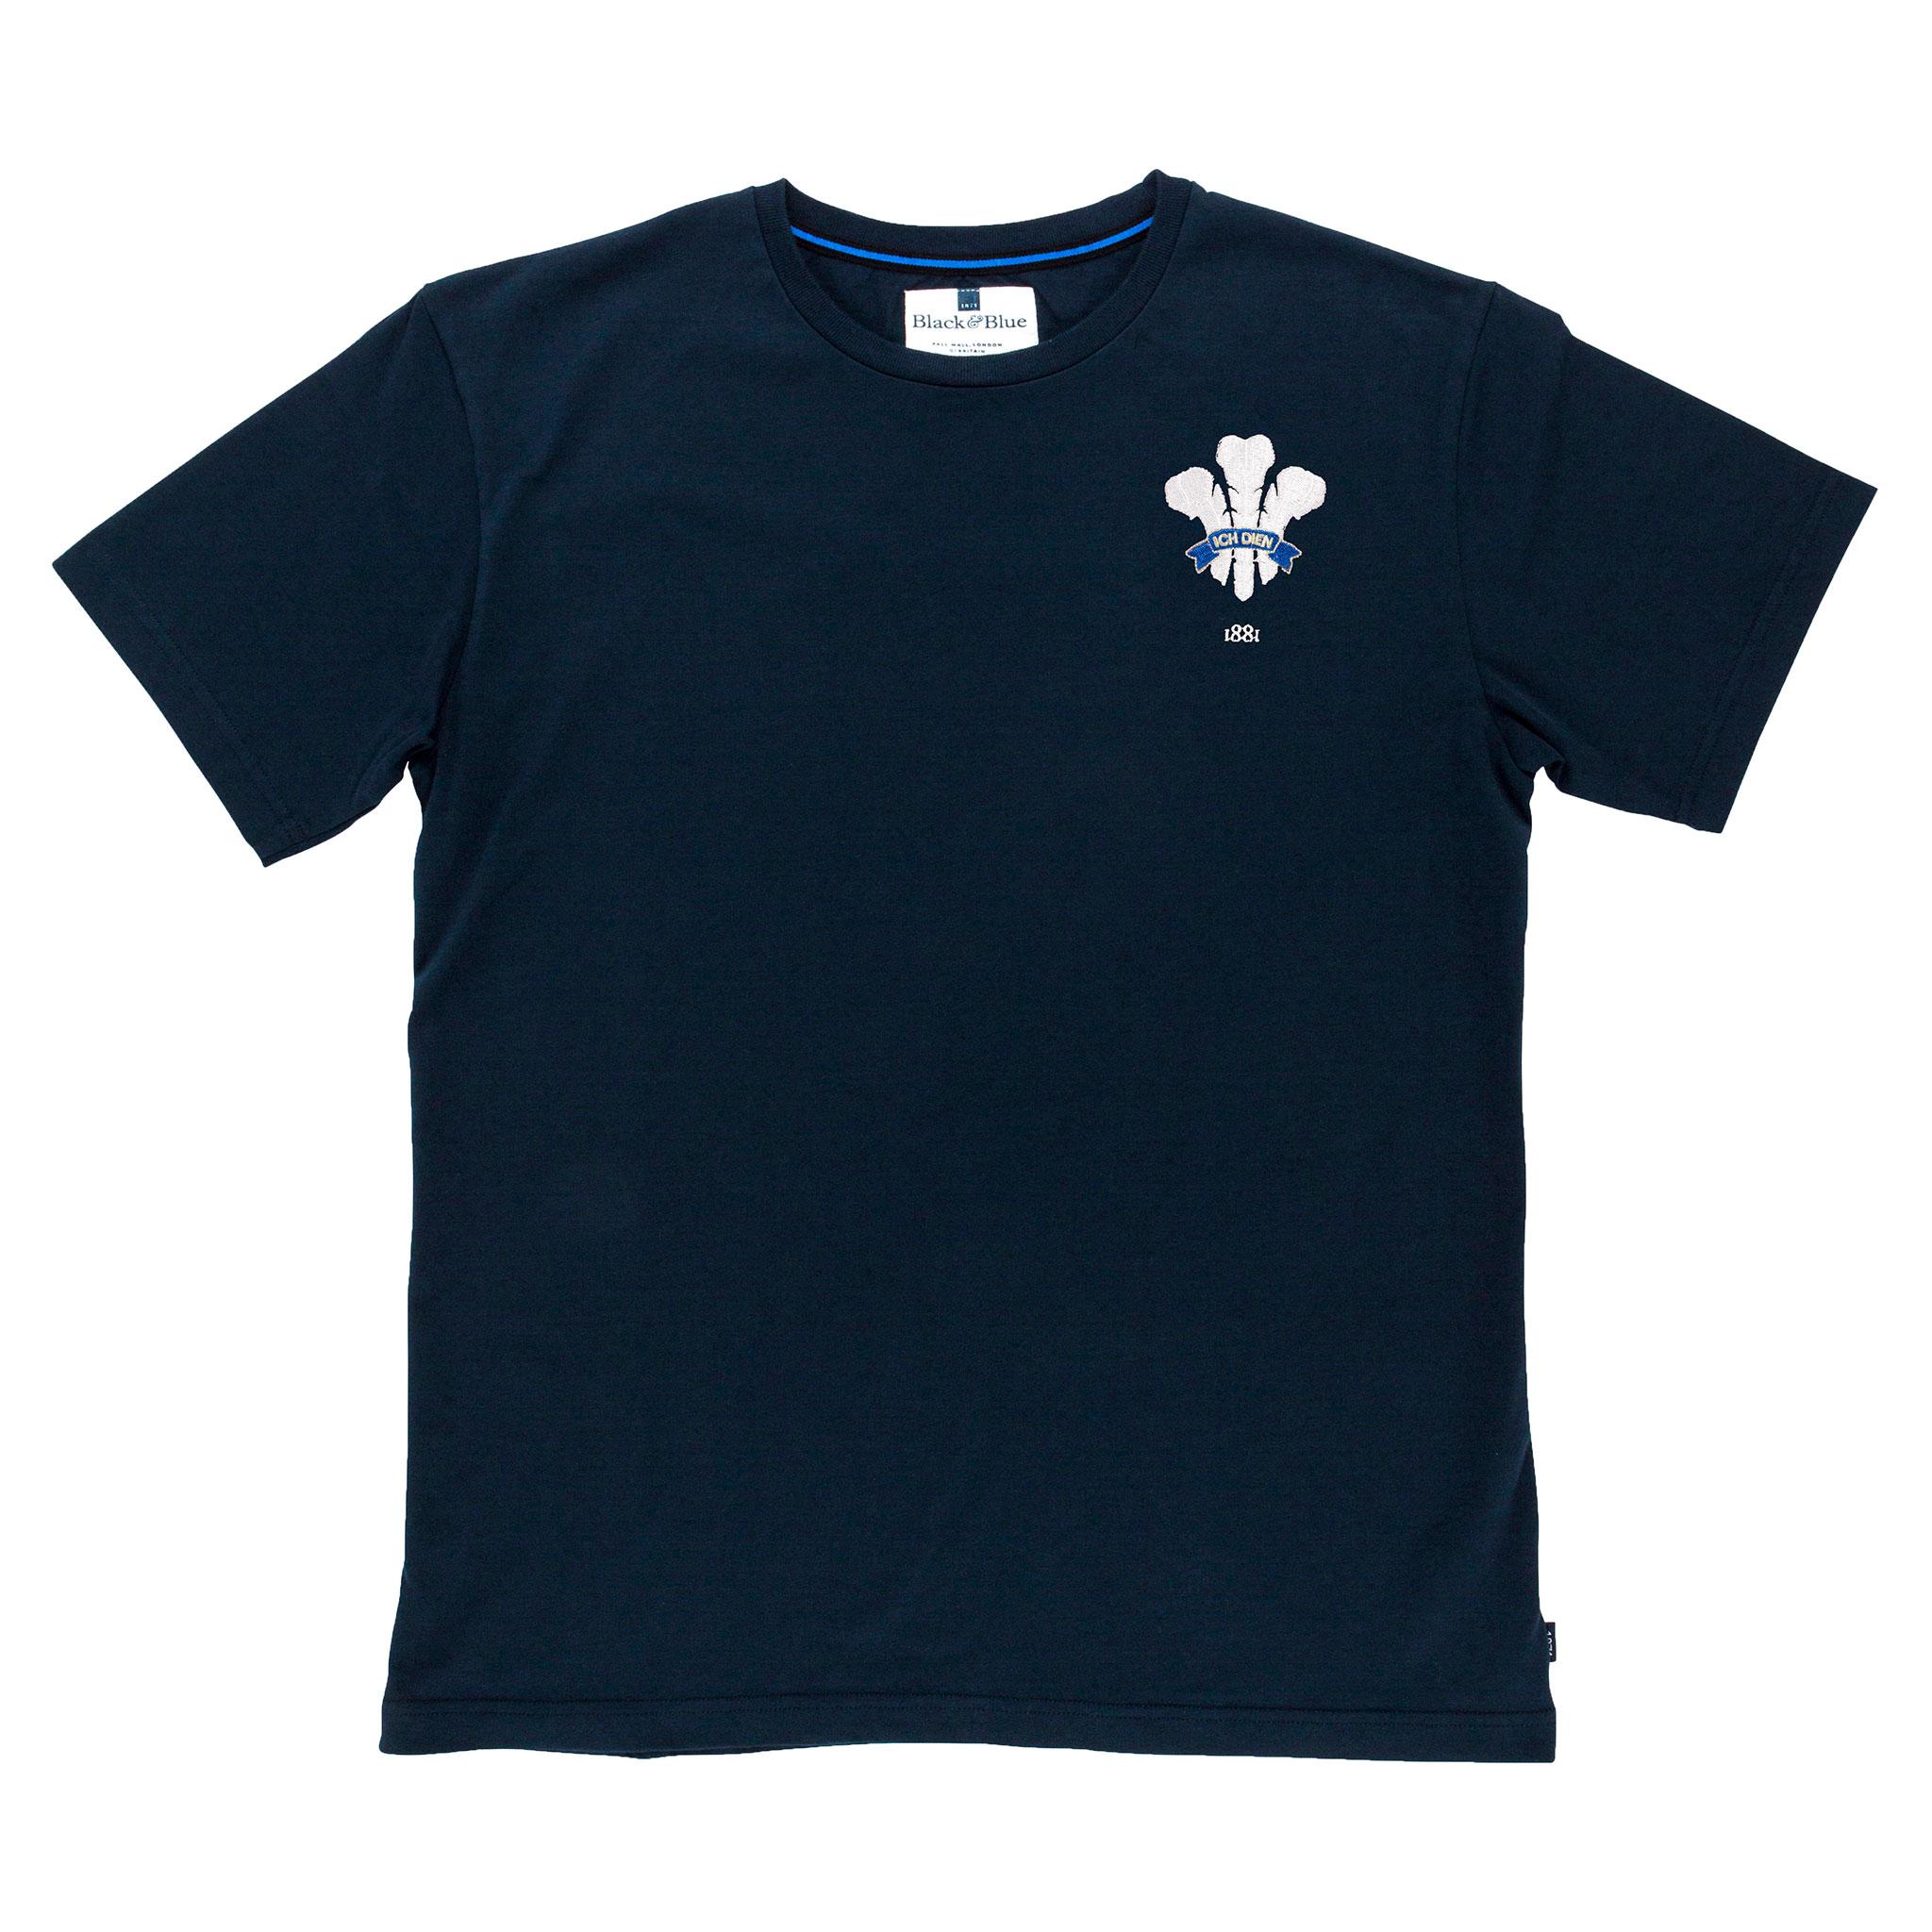 Wales 1881 Navy Tshirt_Front